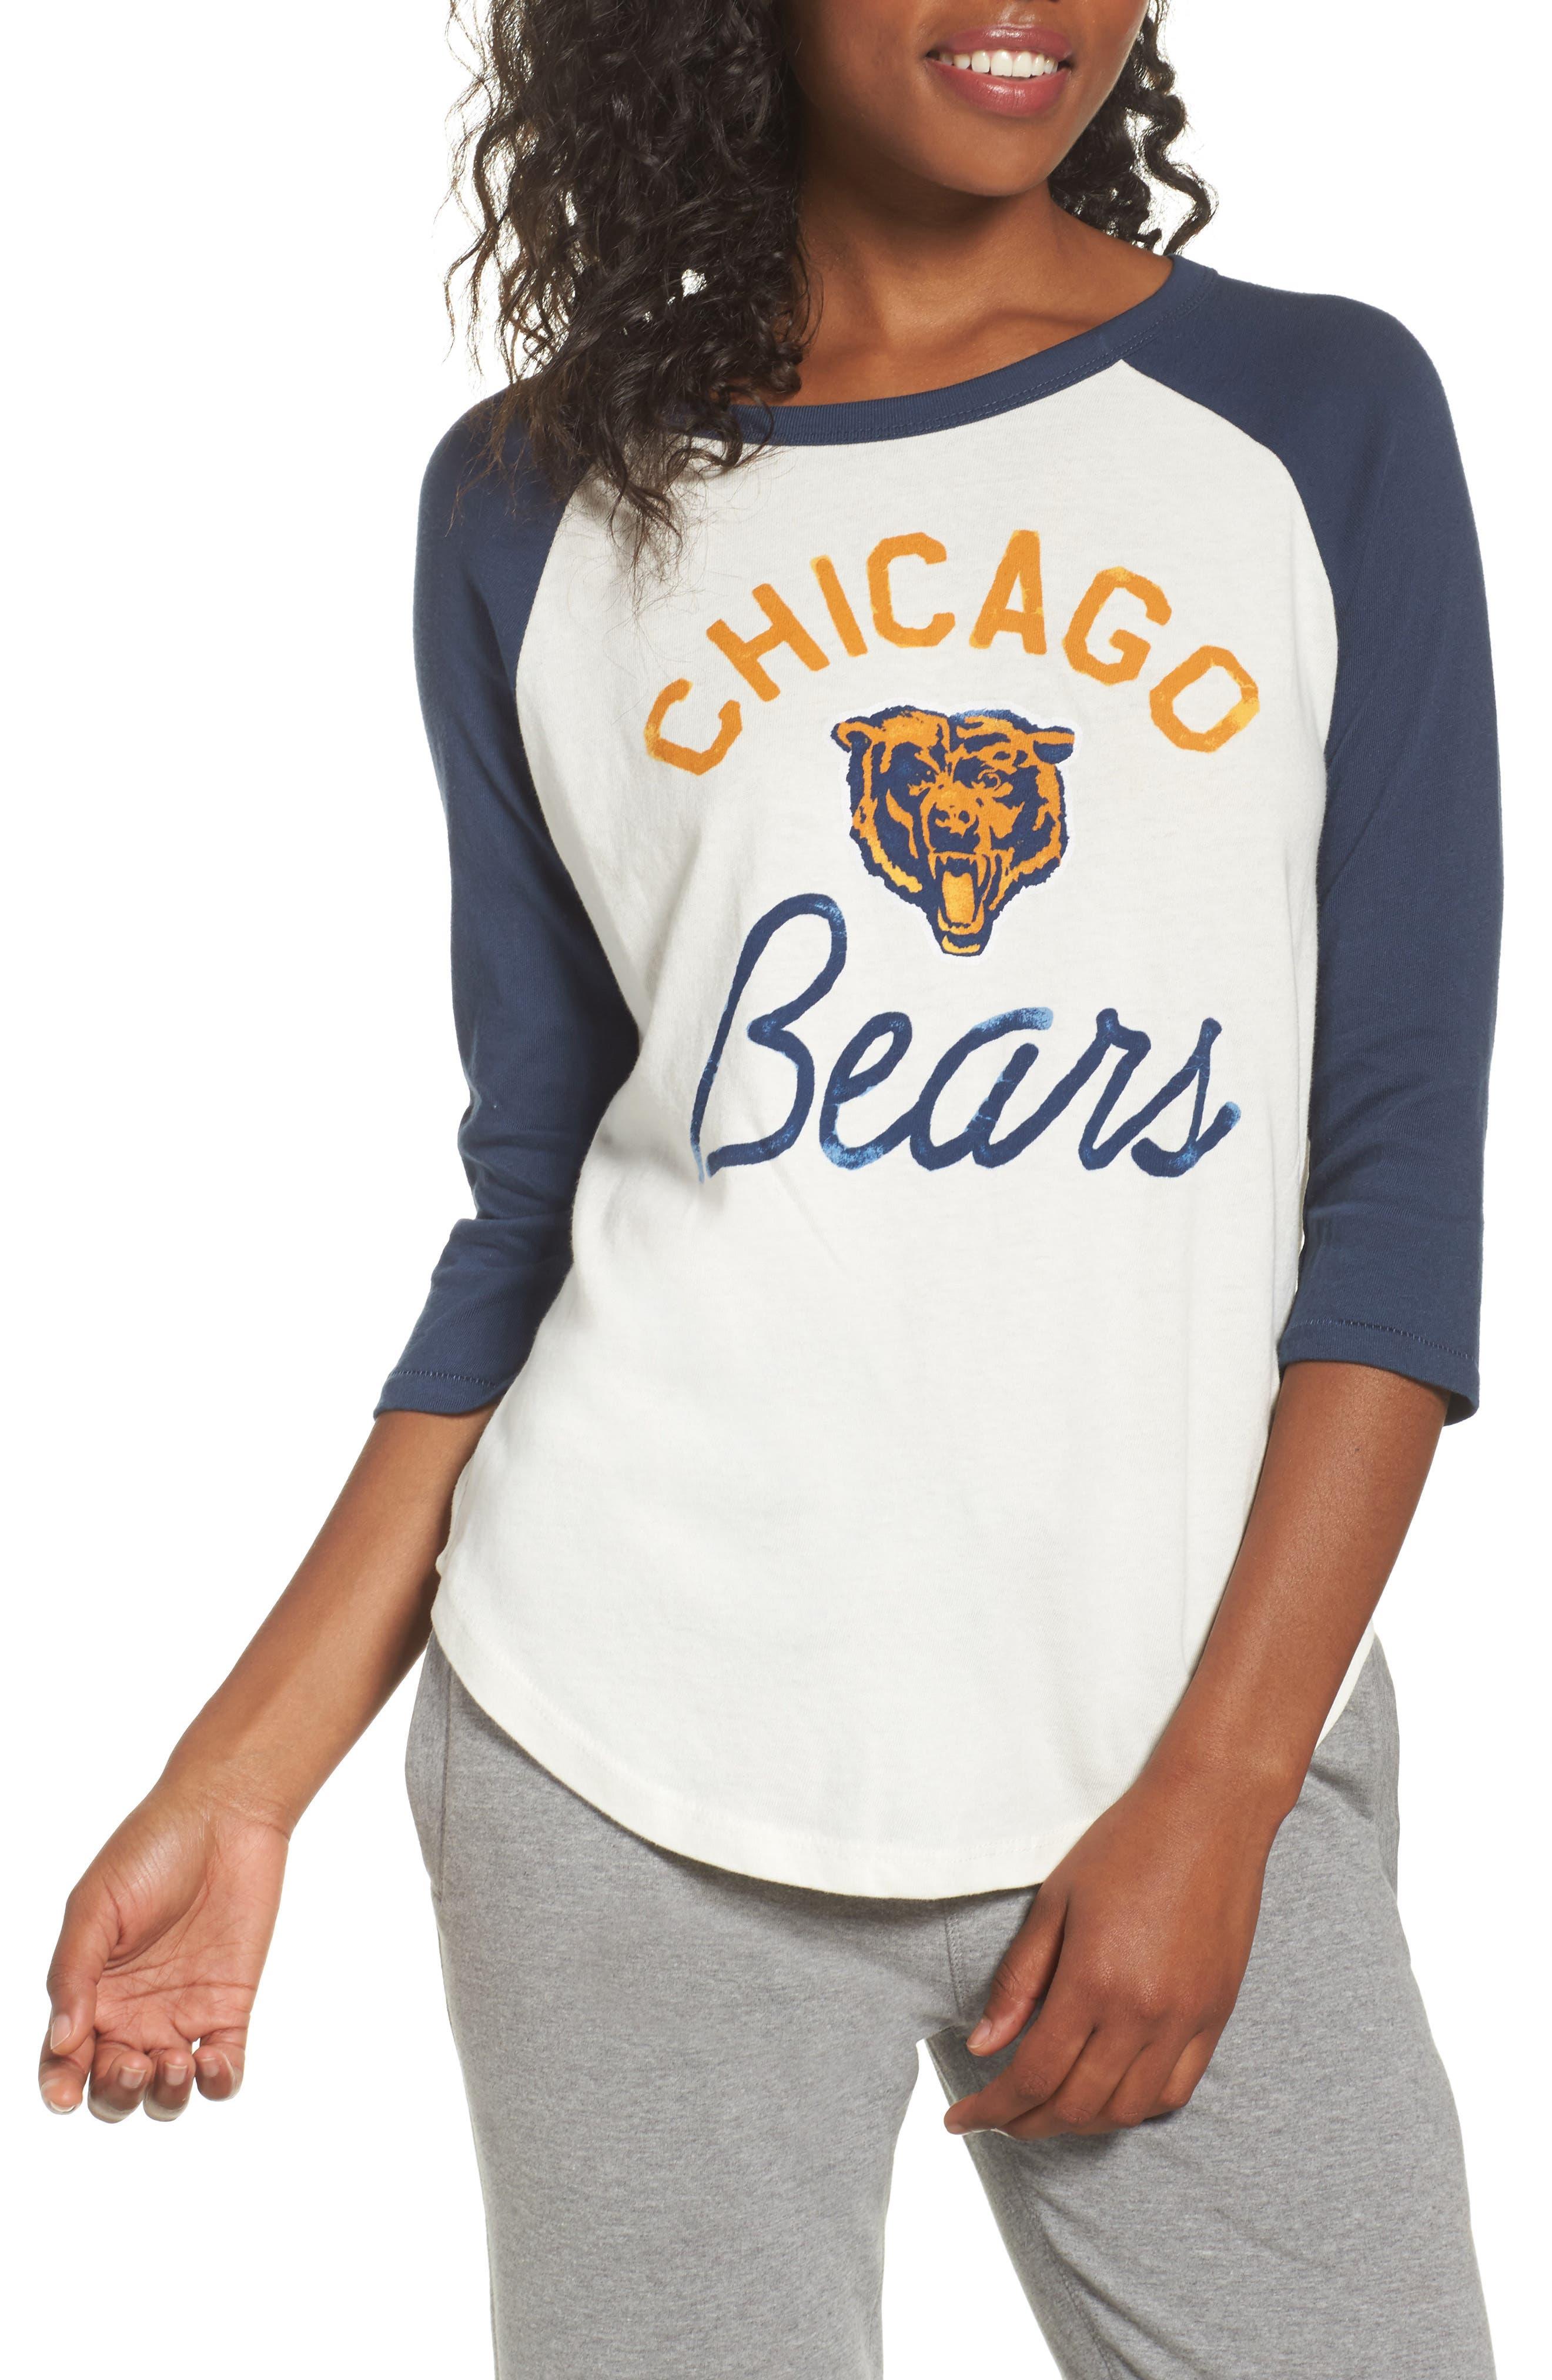 NFL Chicago Bears Raglan Tee,                         Main,                         color, Sugar/ True Navy